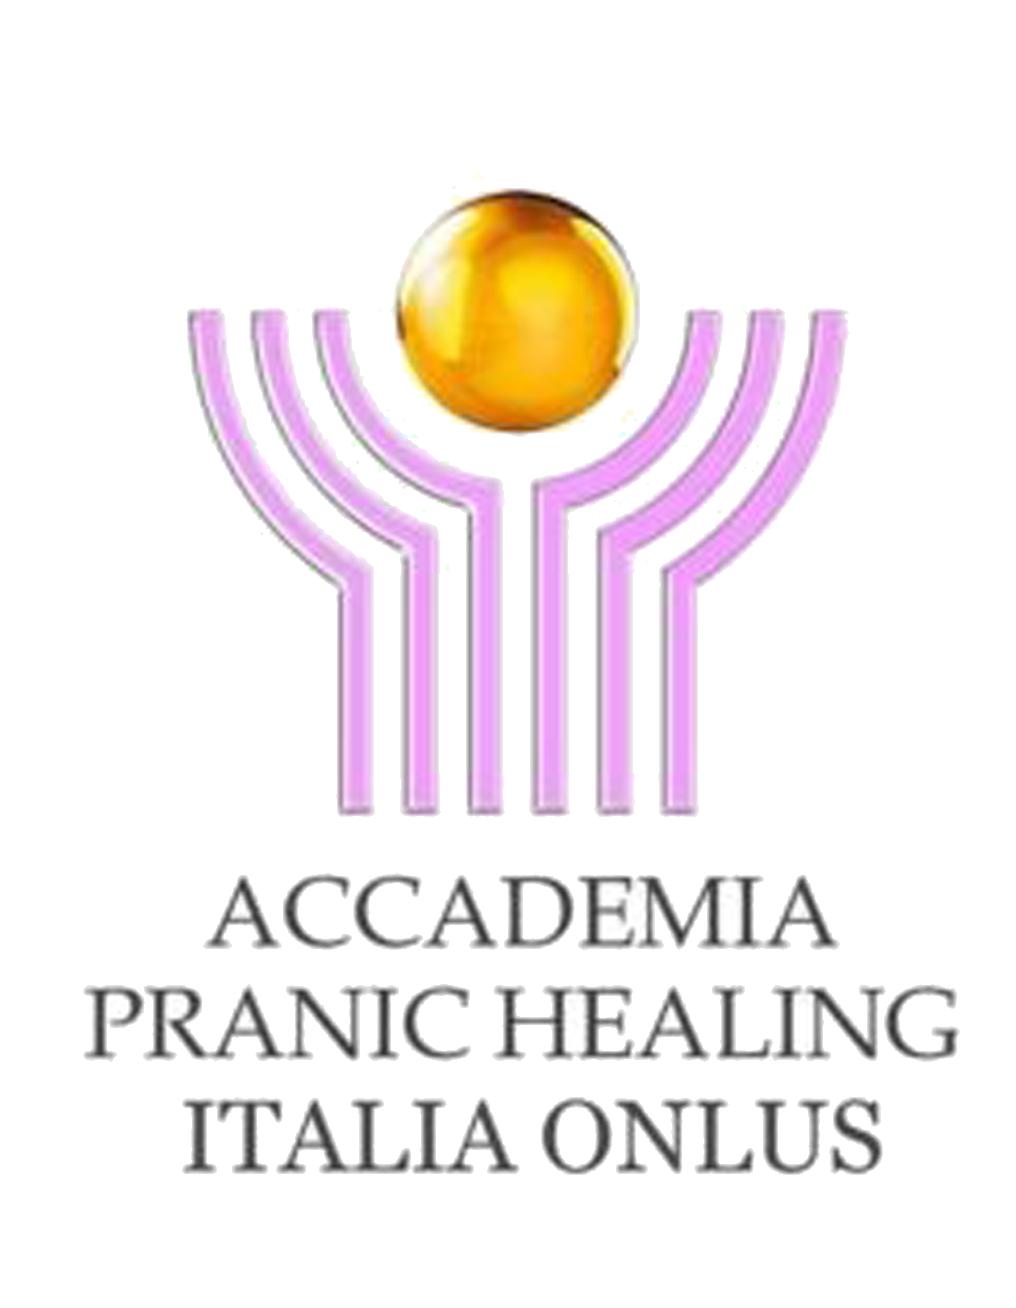 Accademia Pranic Healing